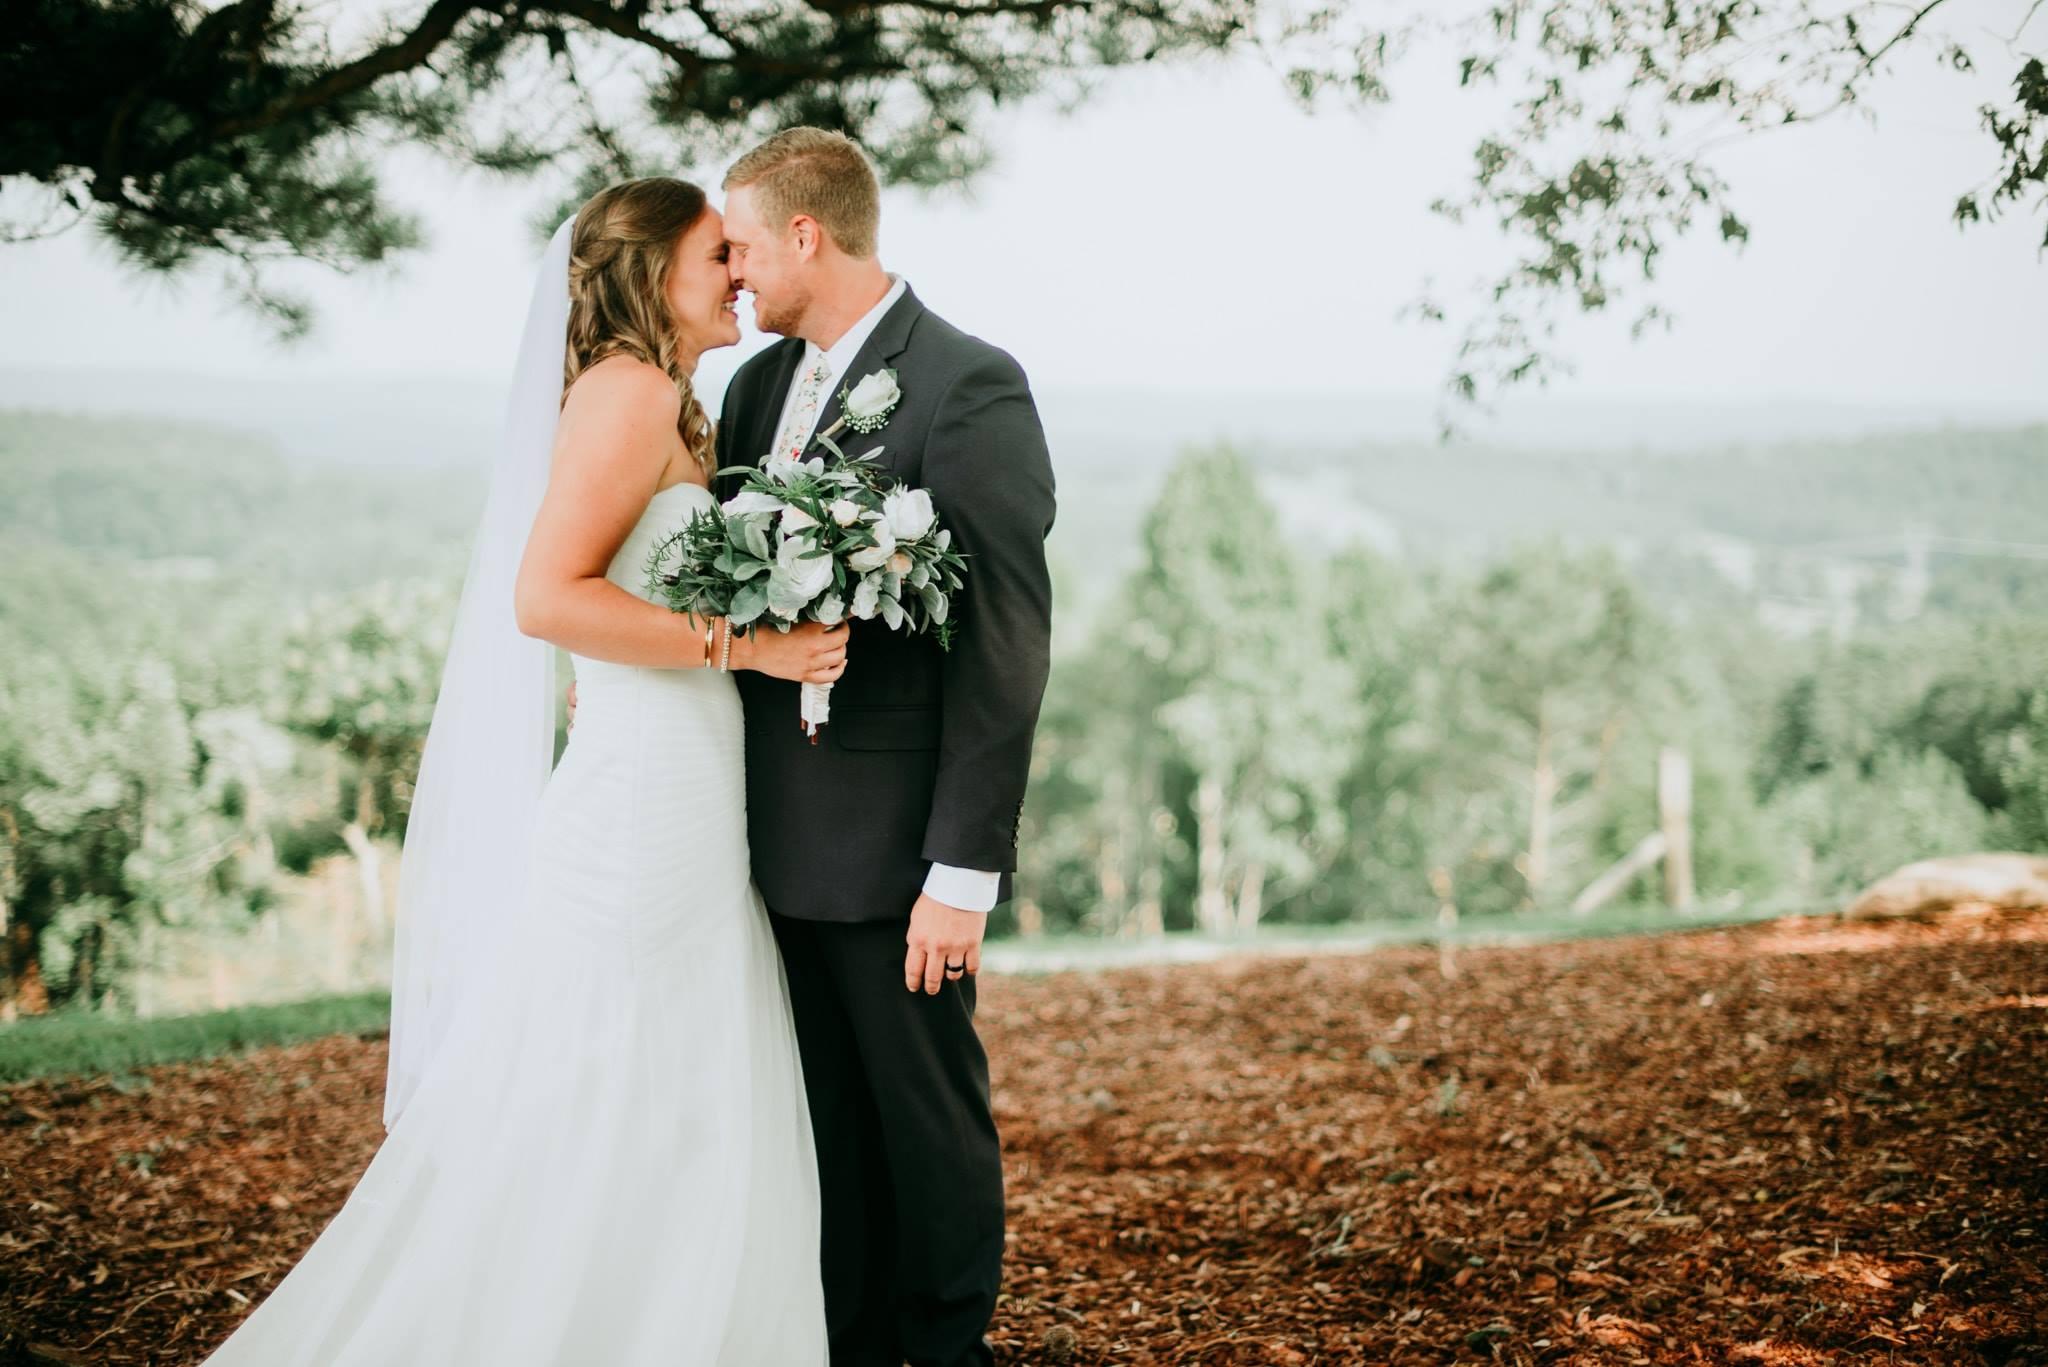 Alexis & Spencer Smith - July 14, 2018Shaundra Olson Photography